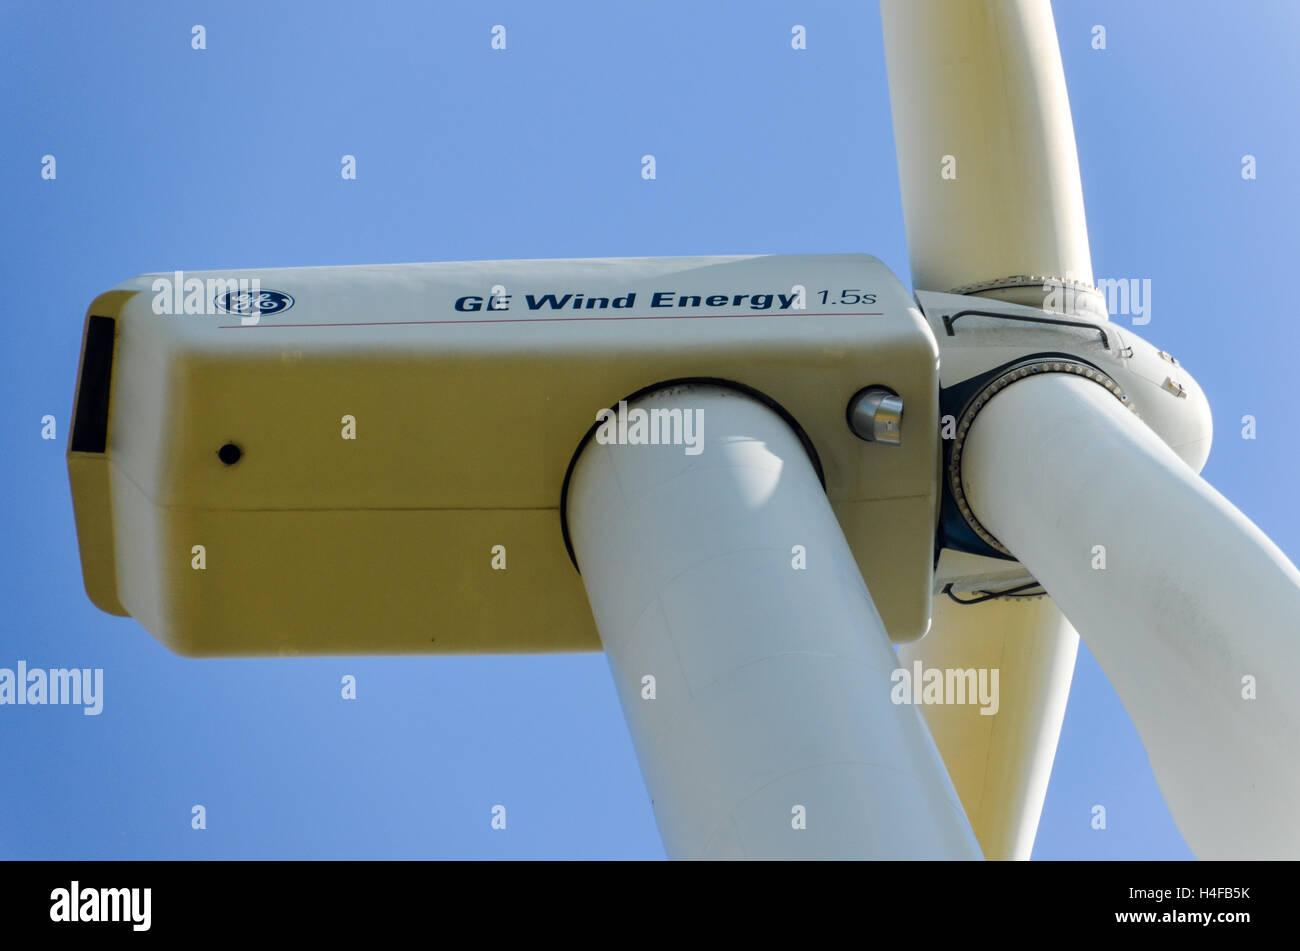 GE Wind Energy 1,5 MW Photo Stock